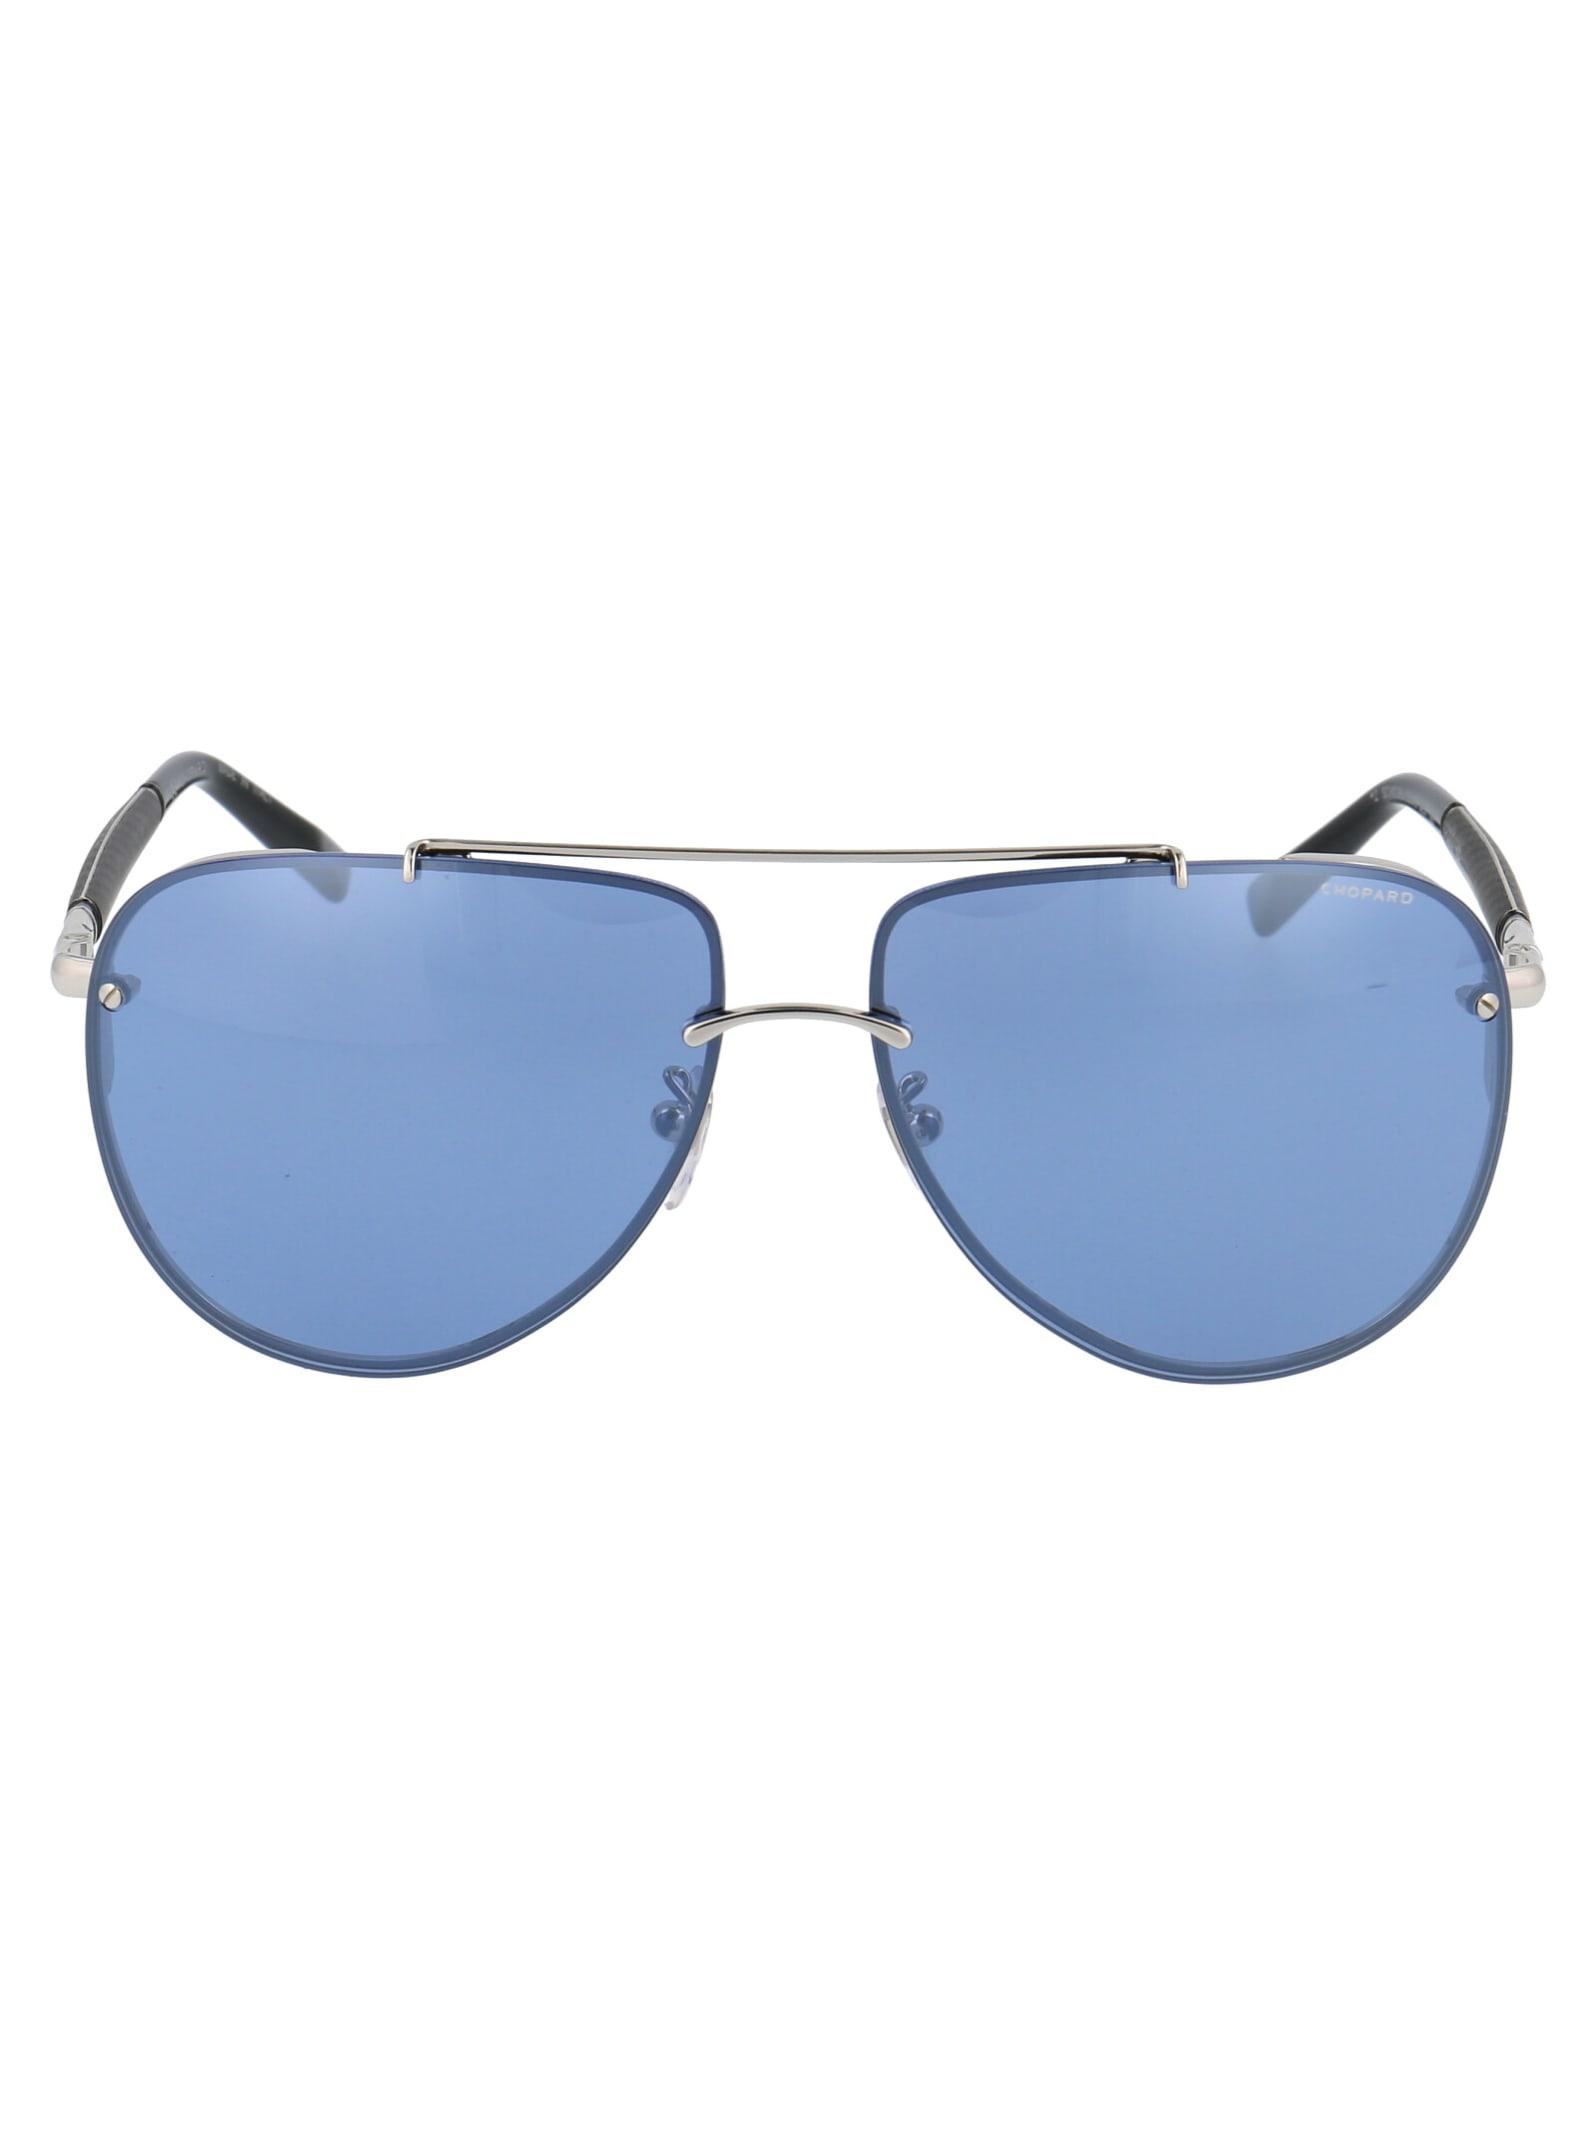 Schc28 Sunglasses